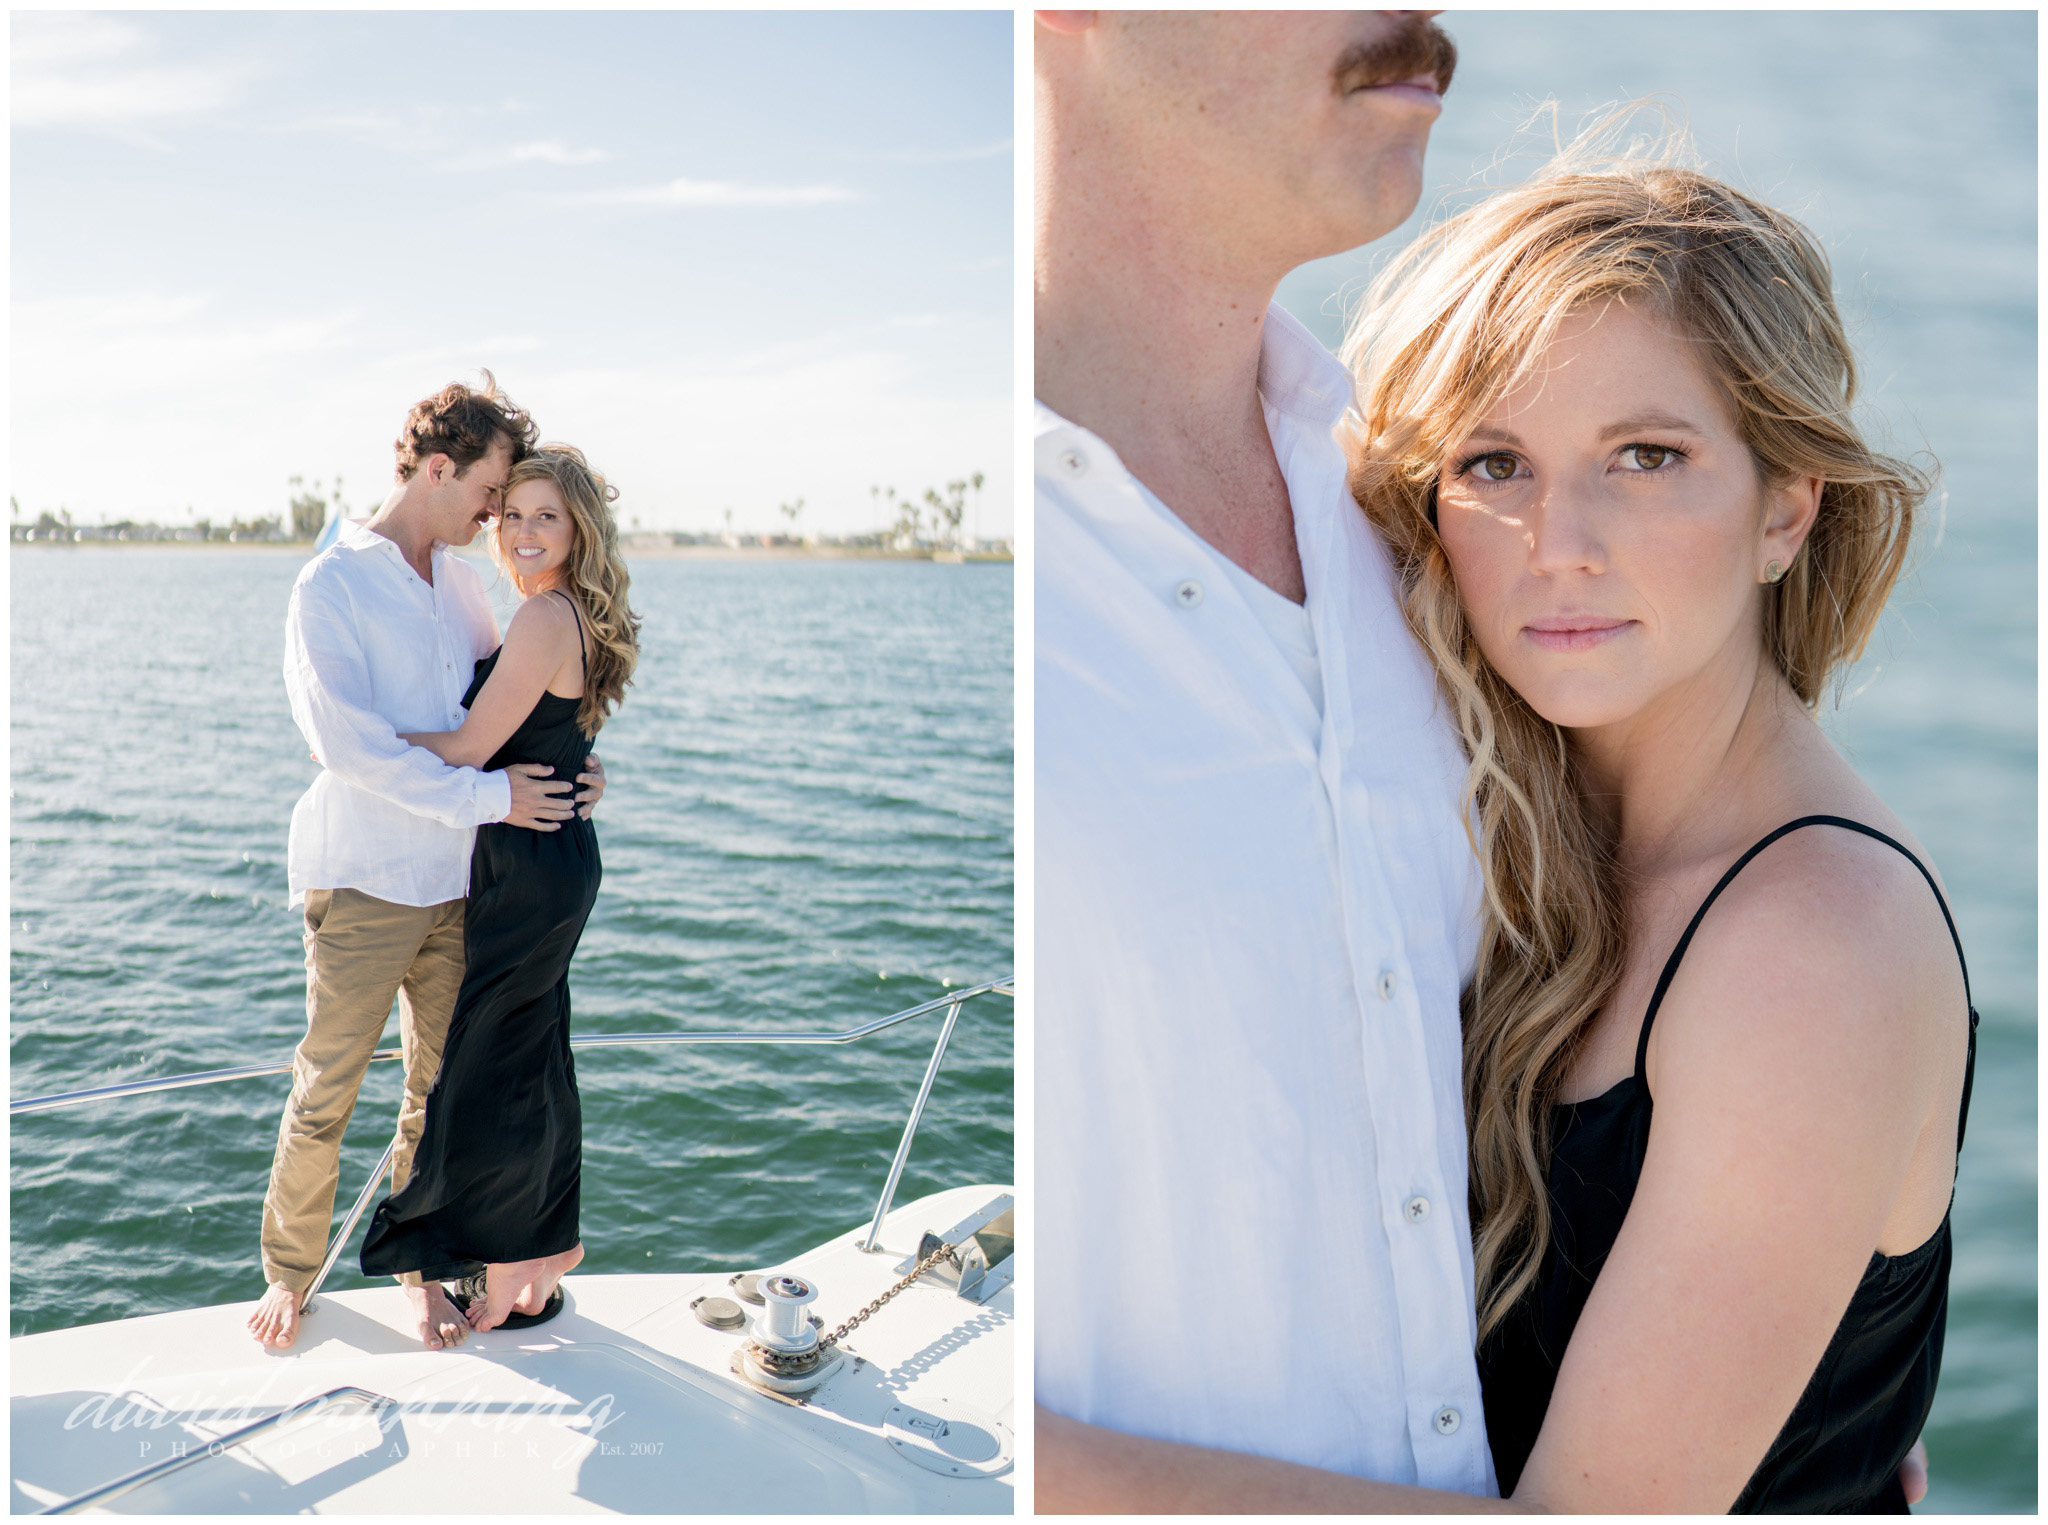 Alyssa-Taylor-Engagement-David-Manning-Photographer-0062.JPG